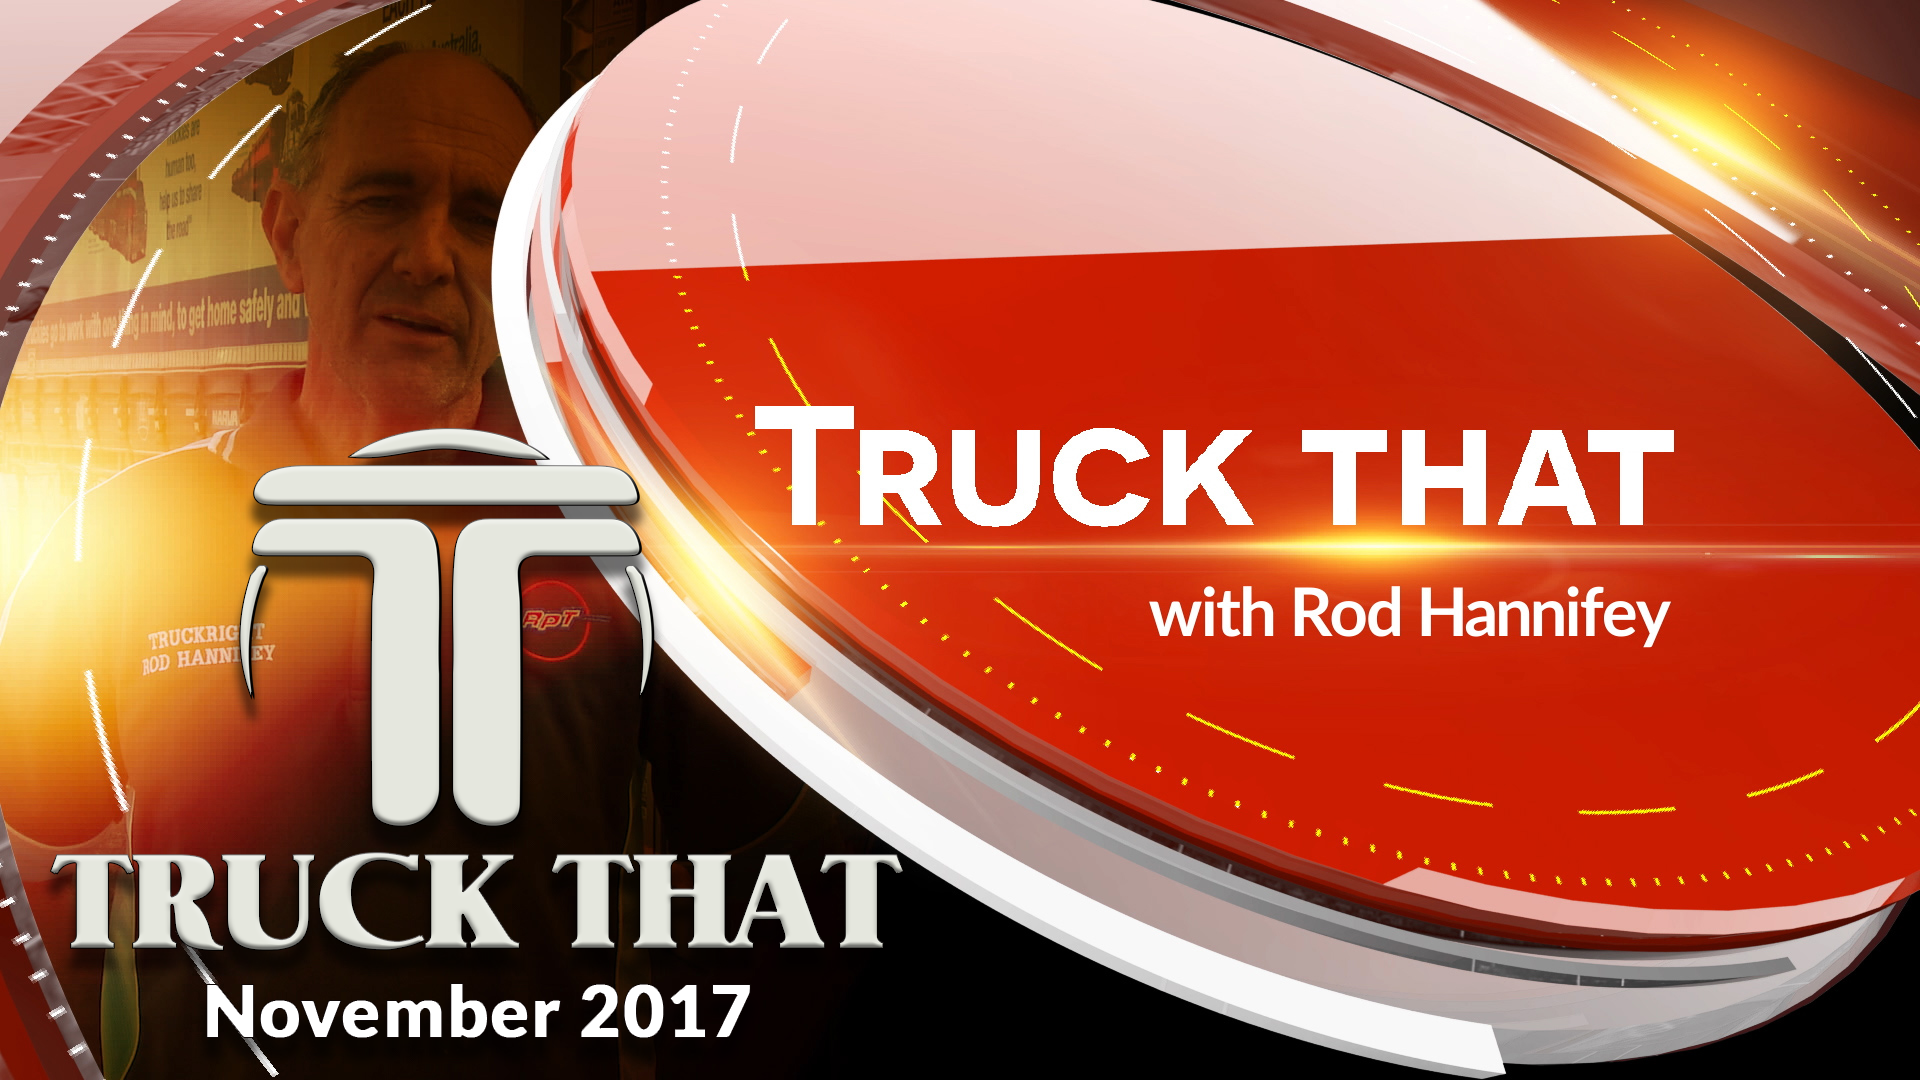 Truck That October 2017